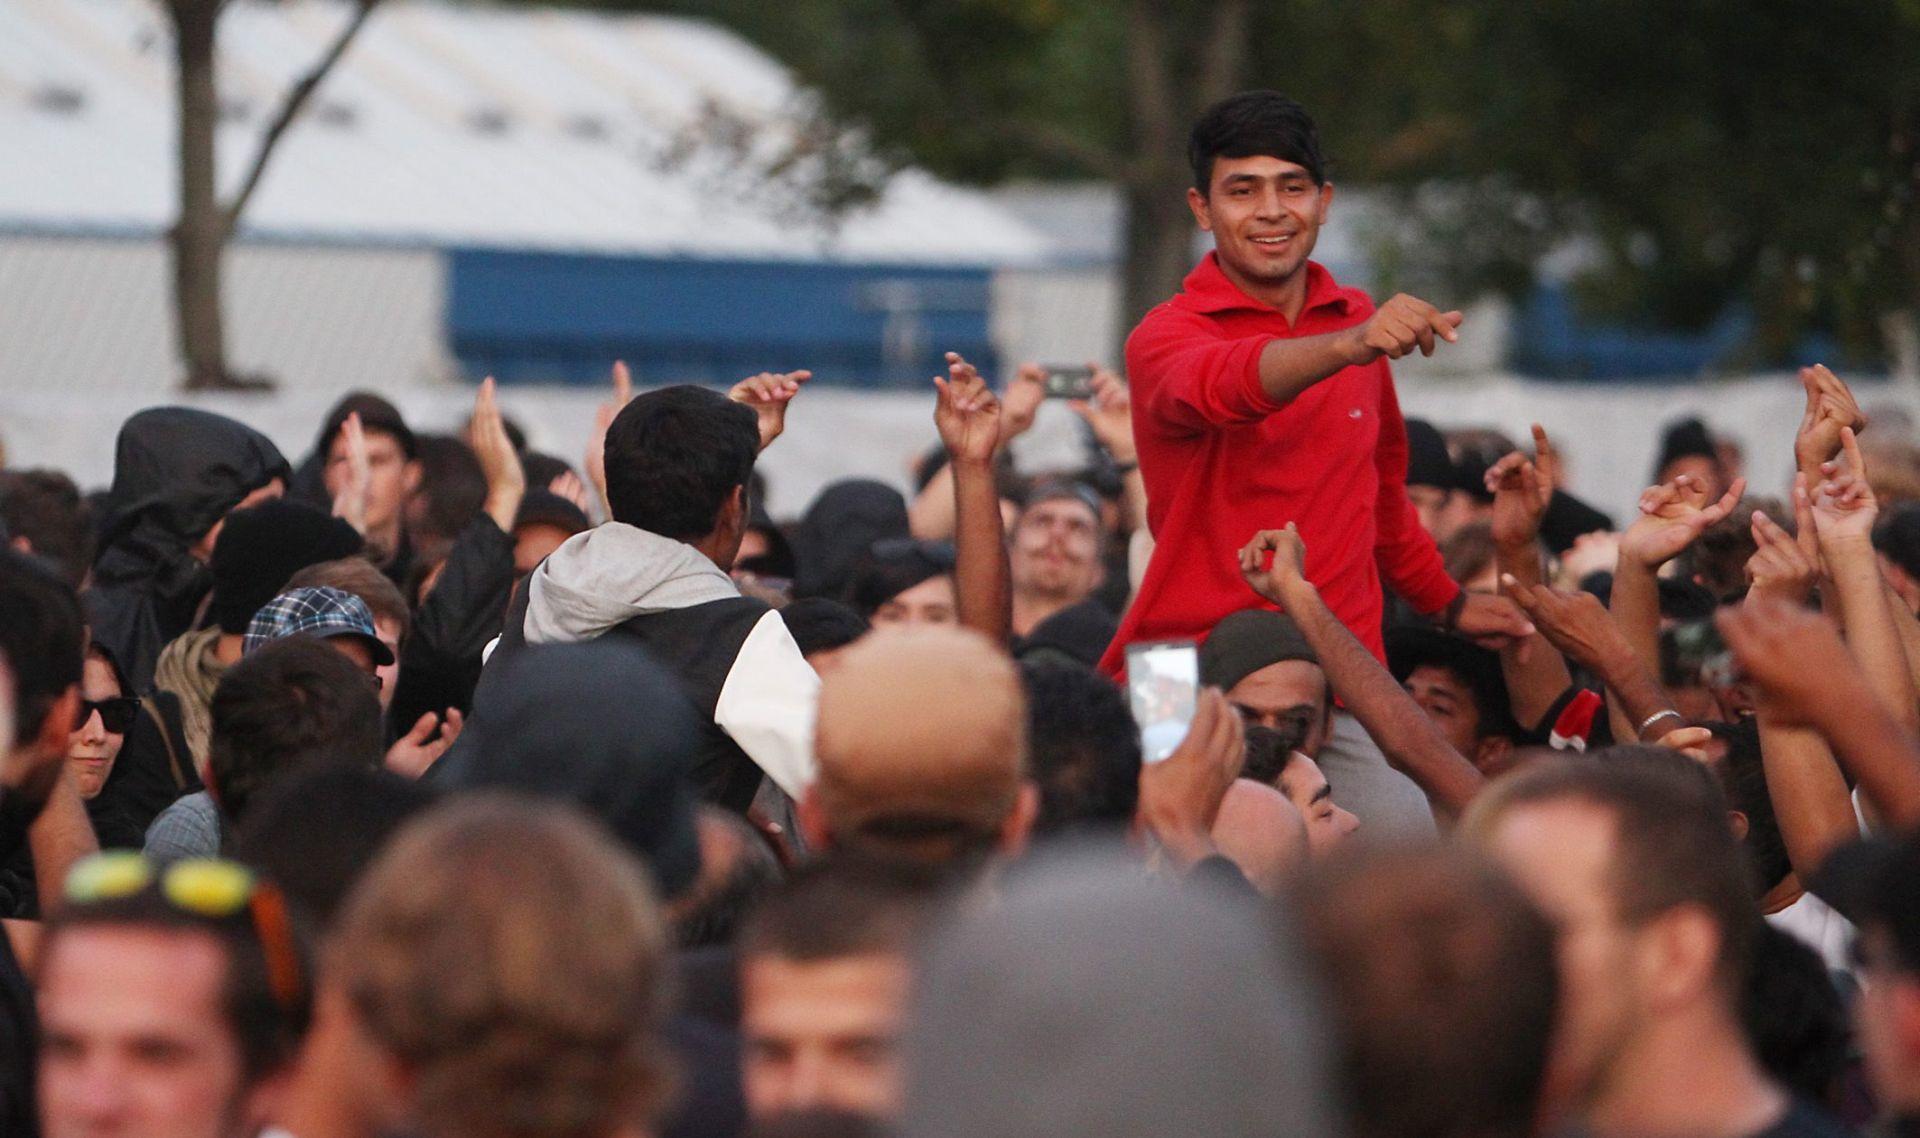 Italija, Francuska i Njemačka za razmatranje pravila EU-a o azilu